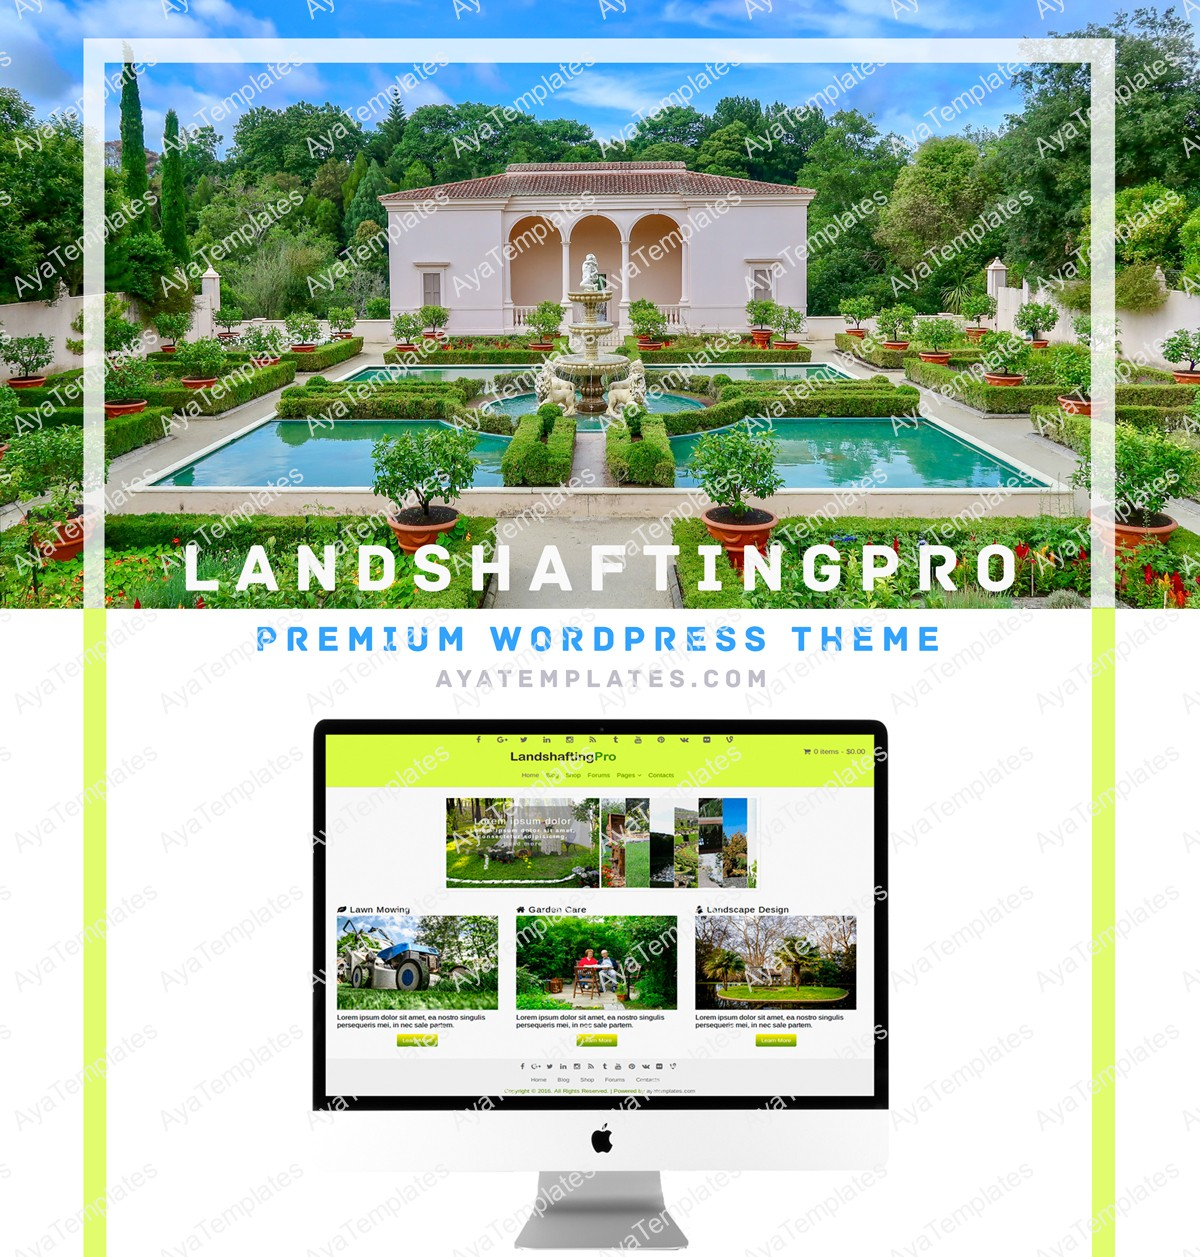 Landshaftingpro-premium-wordpress-theme